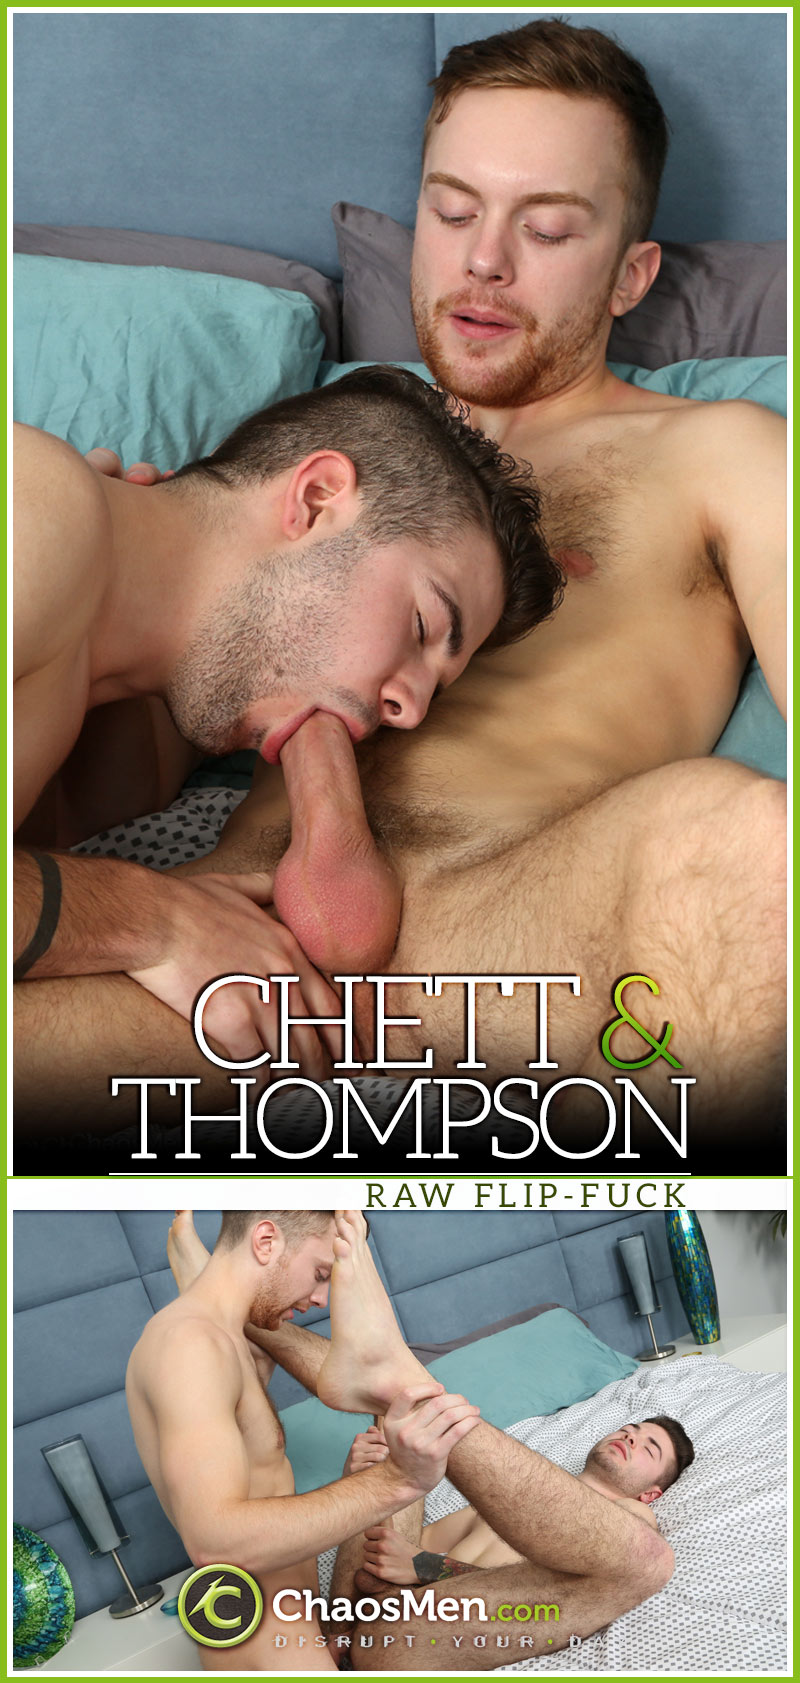 Chett and Thompson [Raw Flip-Fuck] at ChaosMen